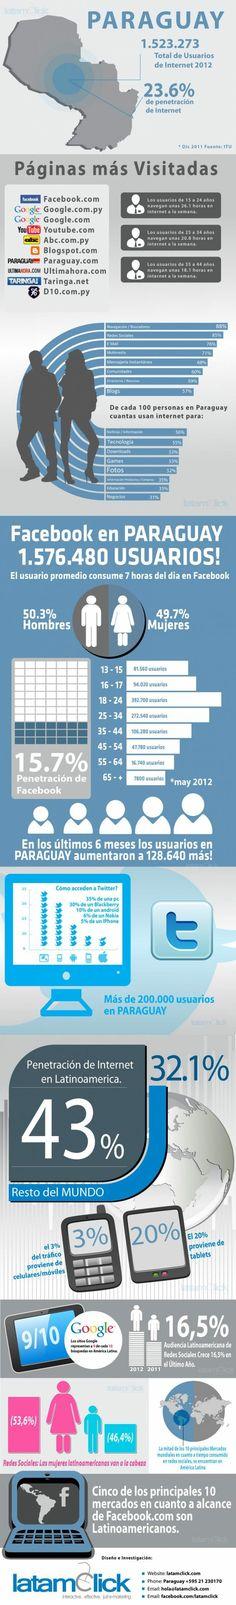 Facebook En Paraguay. interesante